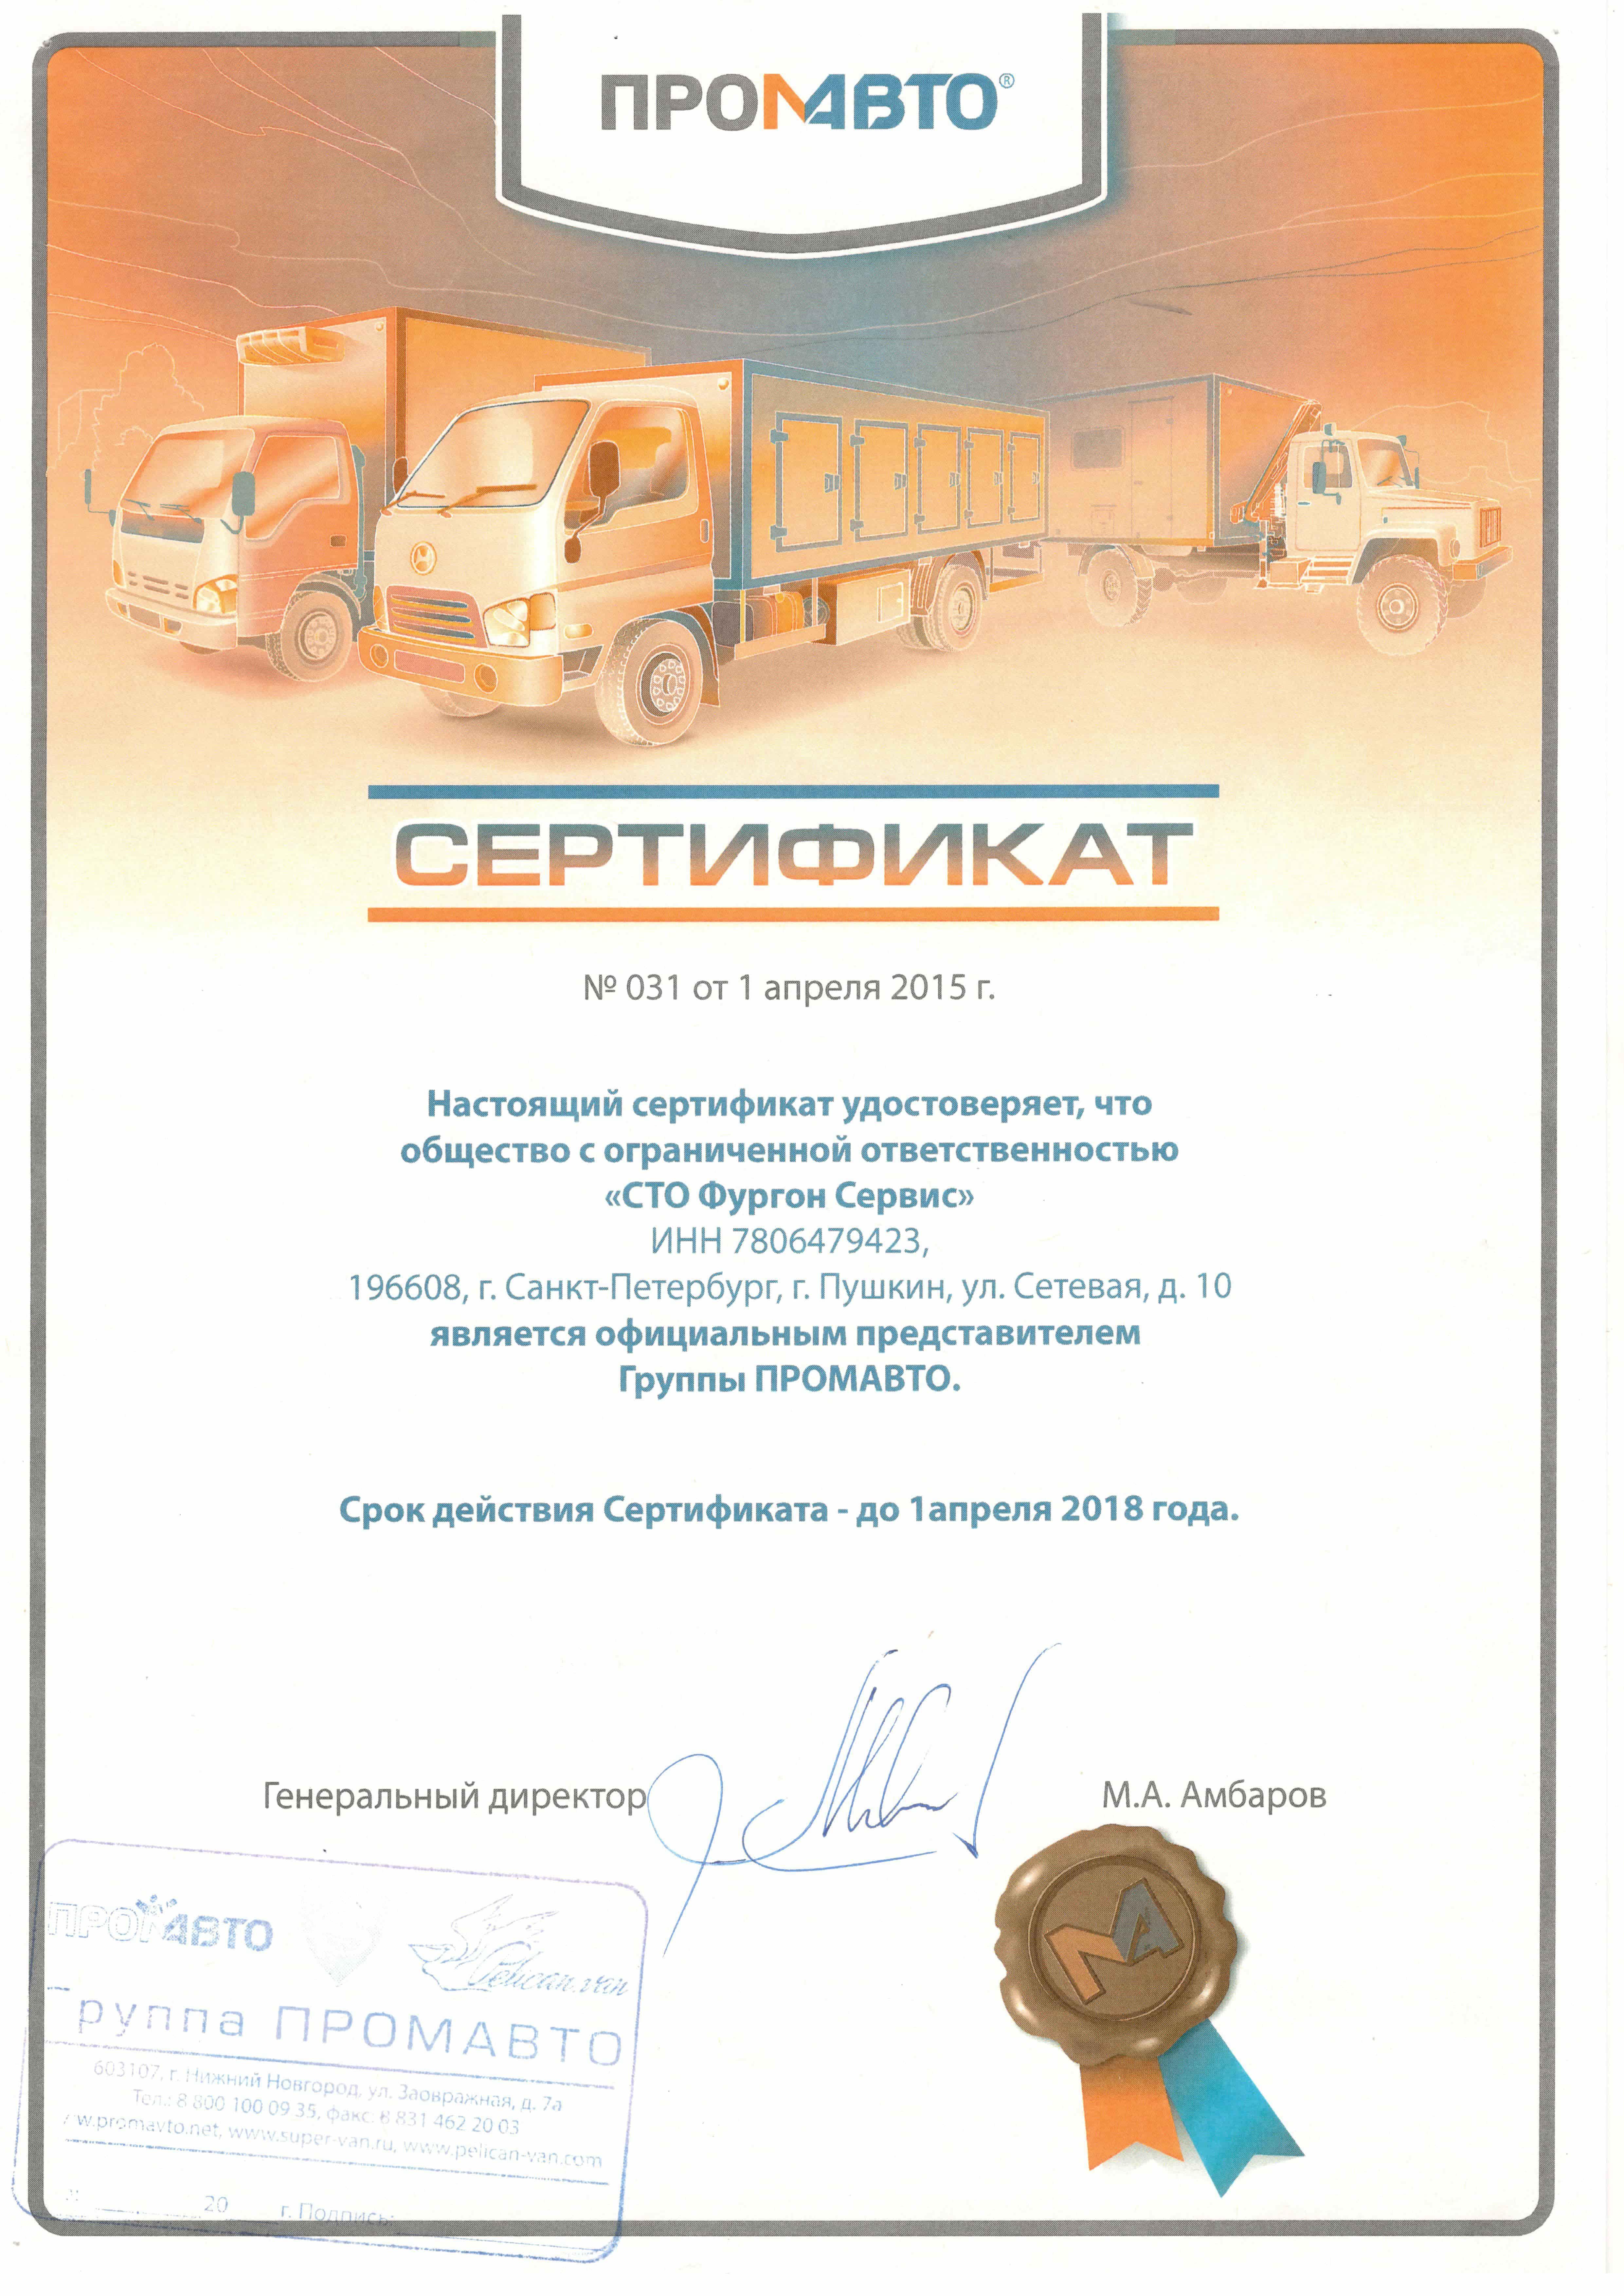 oficialnie_predstaviteli_obslyjivanie_i_remont_furgonov_promauto